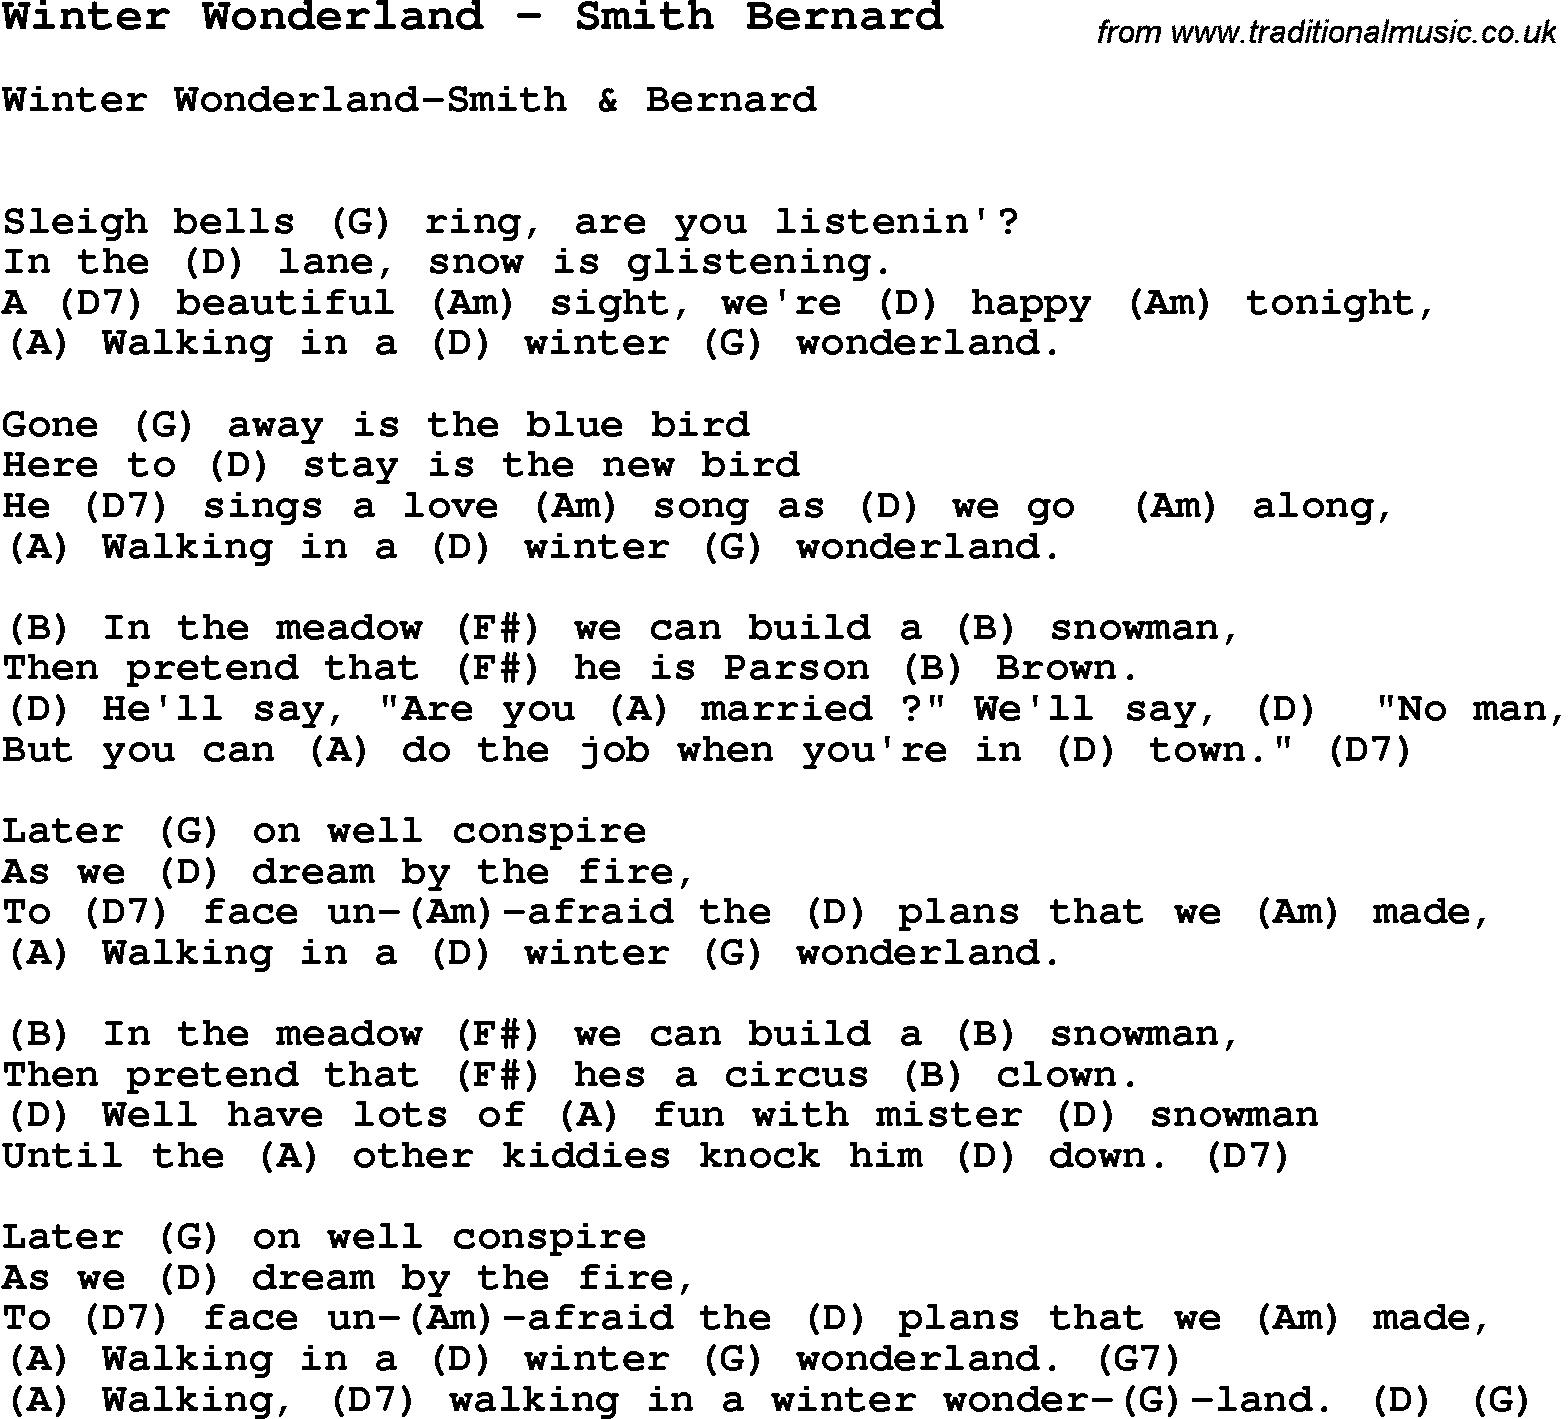 song winter wonderland by smith bernard with lyrics for vocal performance and accompaniment chords for ukulele guitar banjo etc